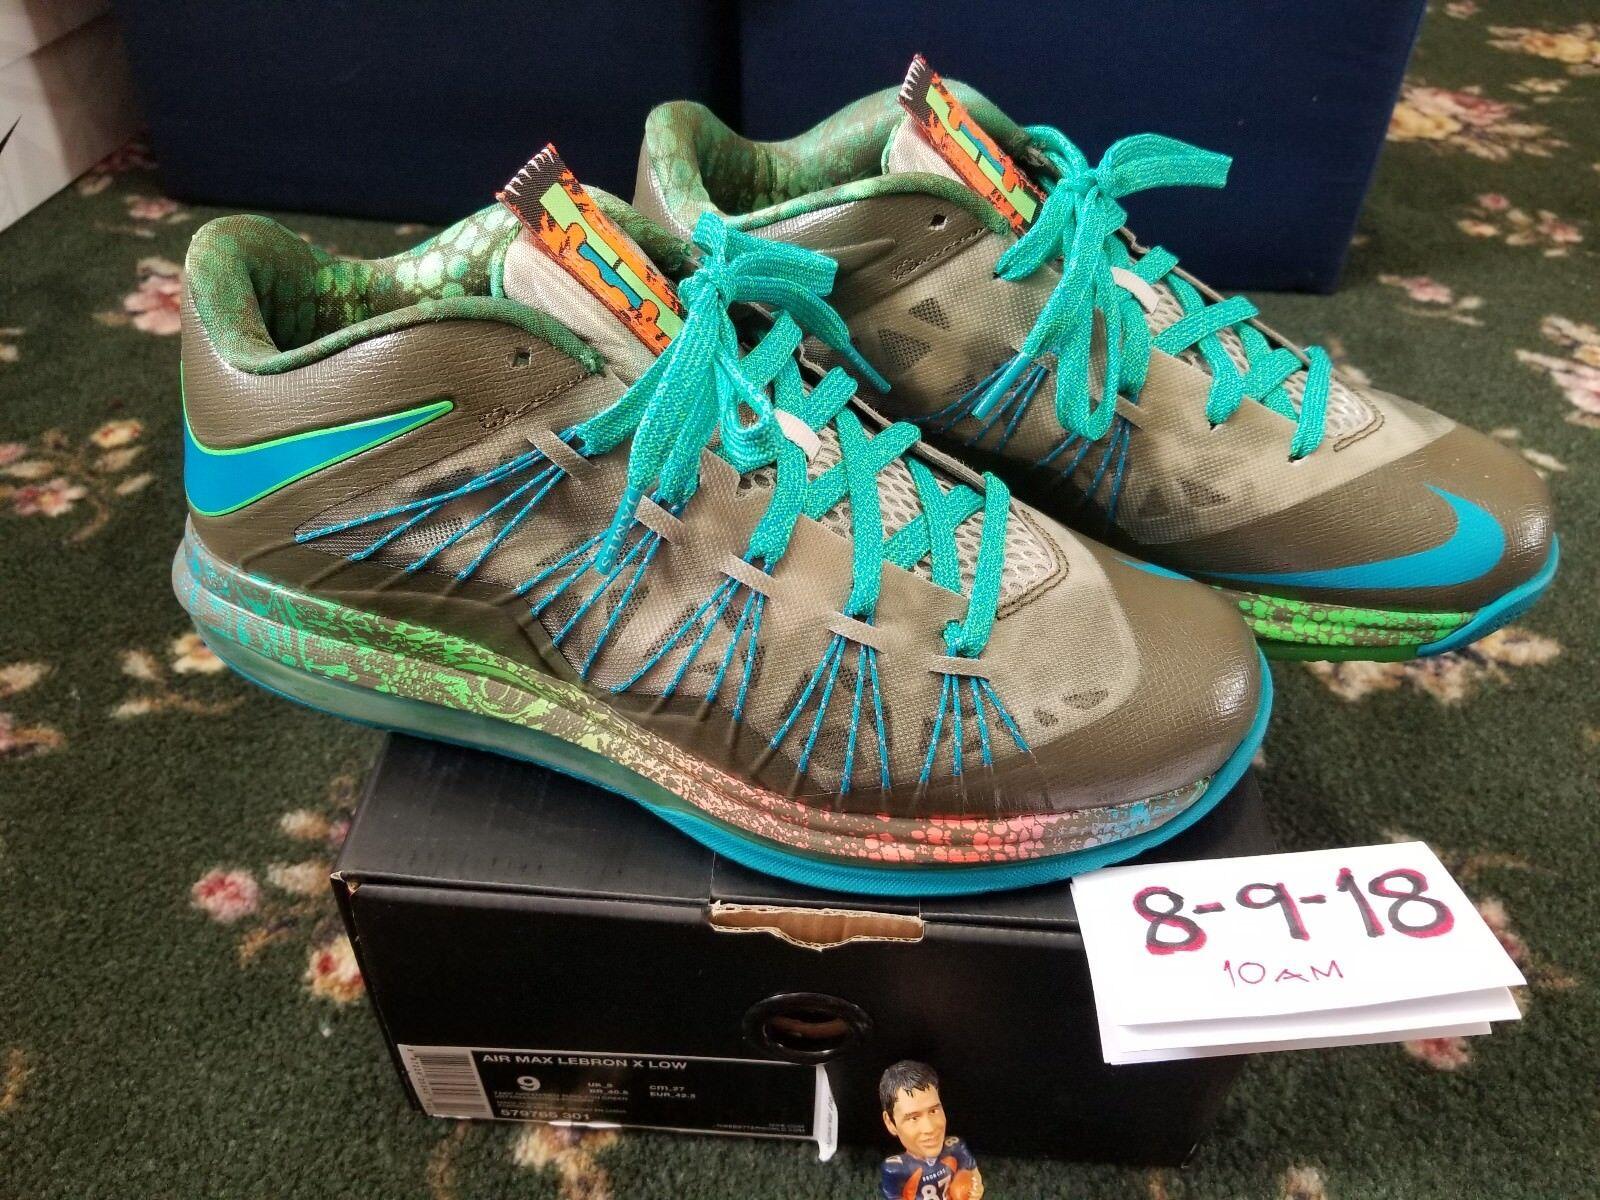 Nike aj retro 14 elite - - elite kd lebron db bin i - v xi yeezy nmd - Größe - 9 (150./eachshoe) 44af75